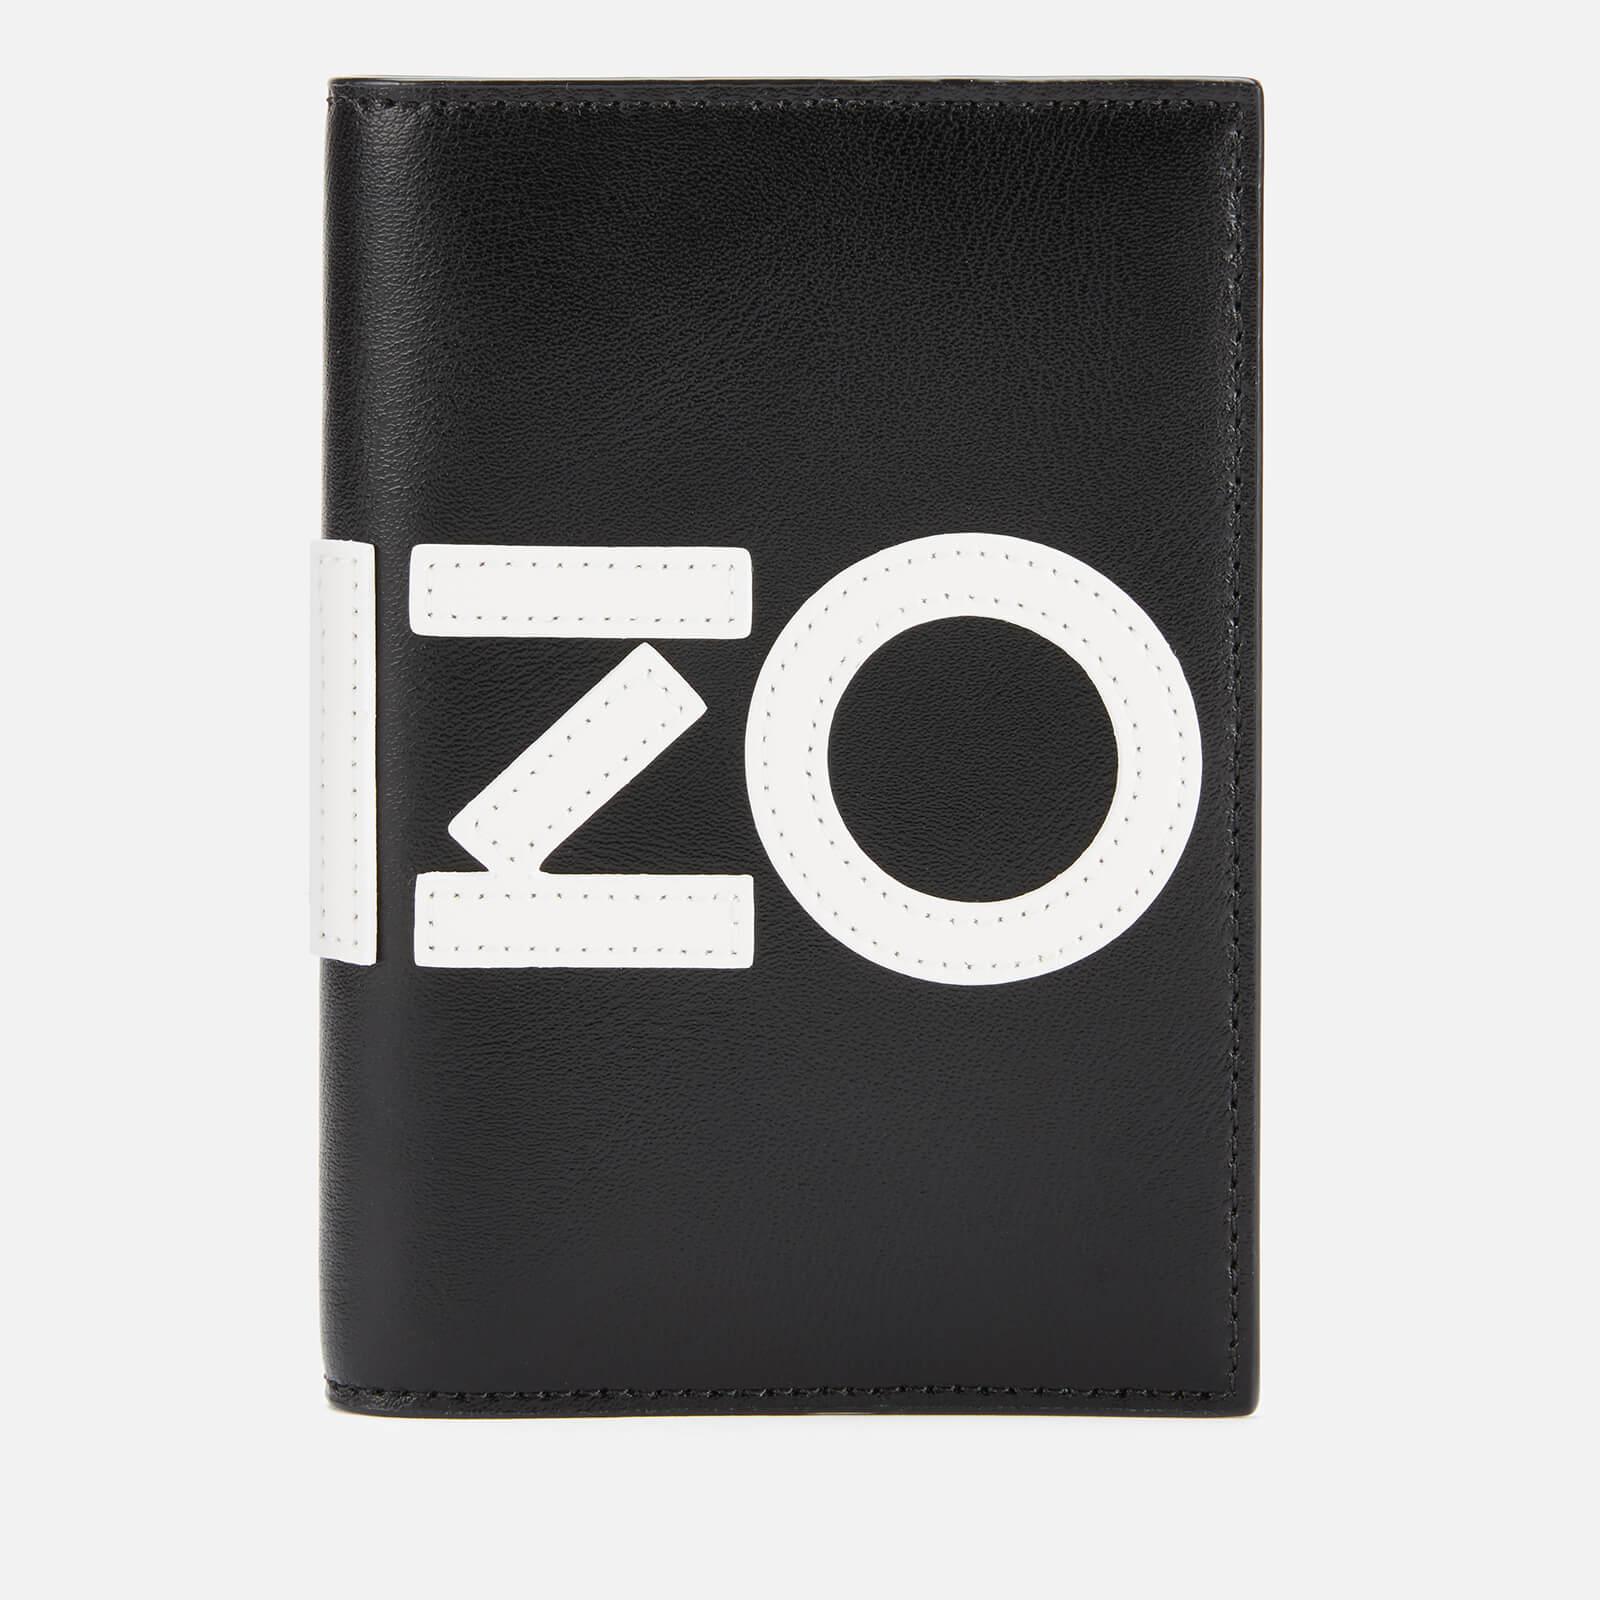 uk availability 91c6f 50973 KENZO Men's Passport Holder - Black